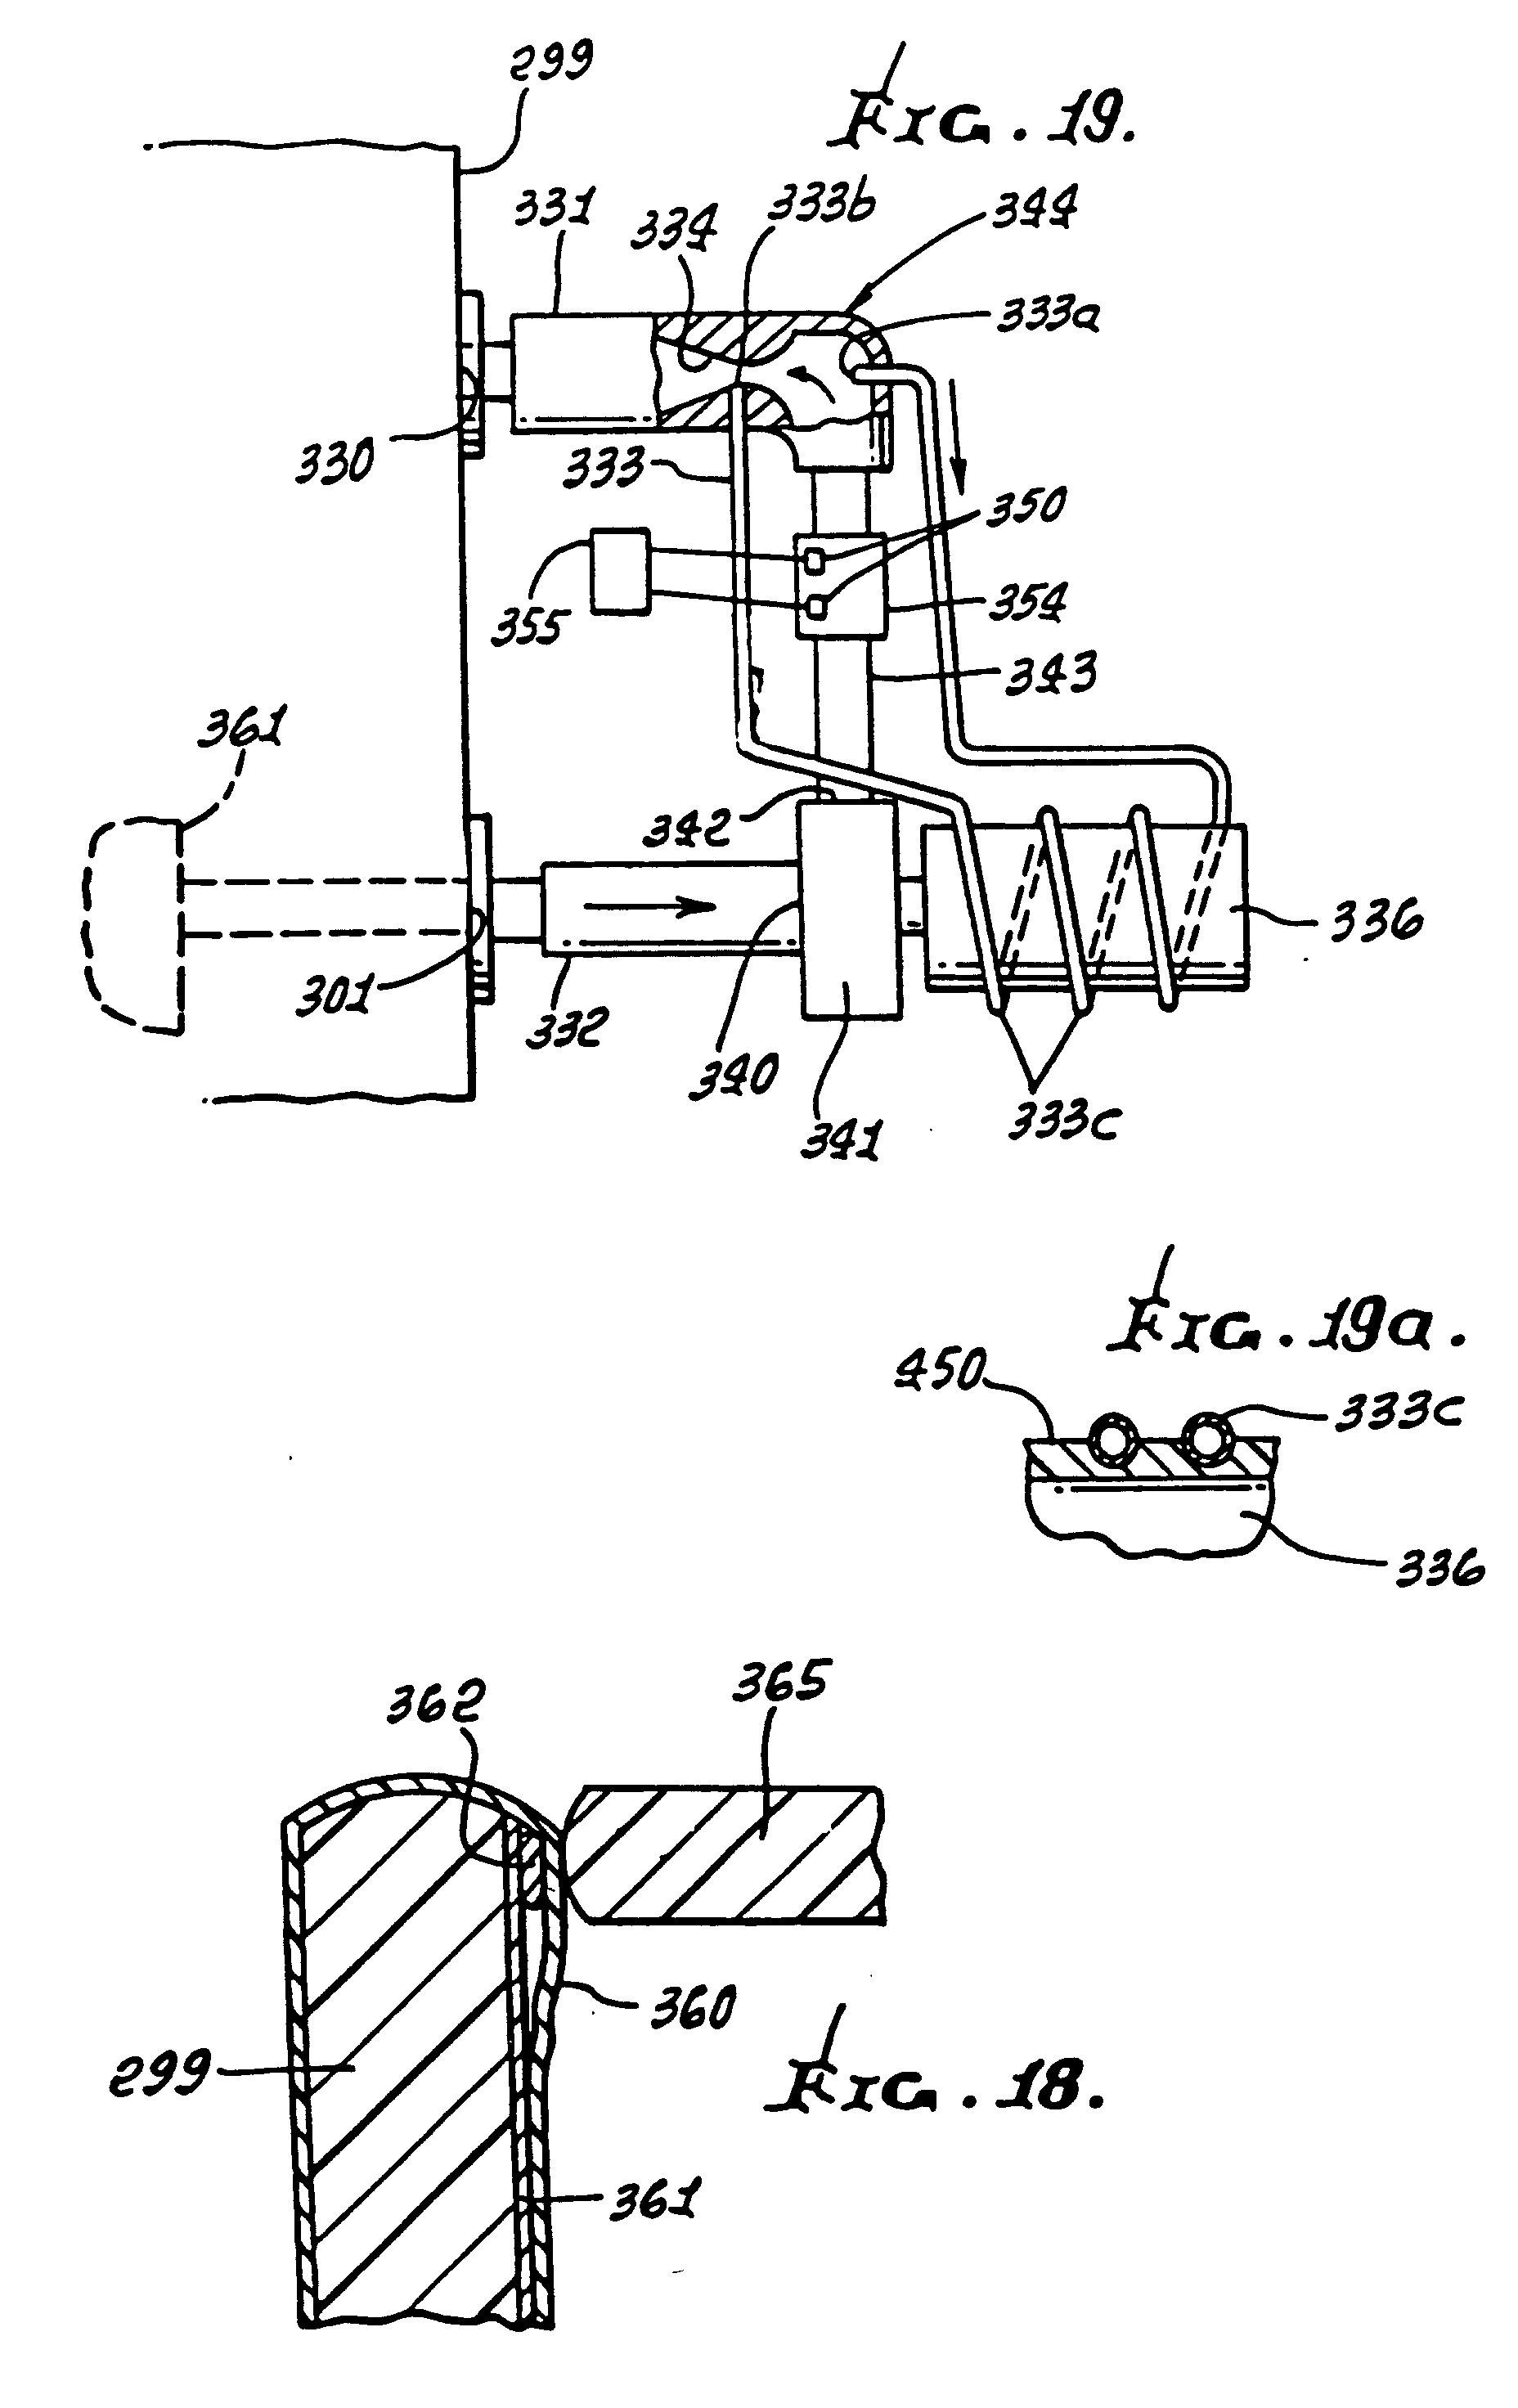 Hayward Super Ii Pump Wiring Diagram Hayward Pool Pump